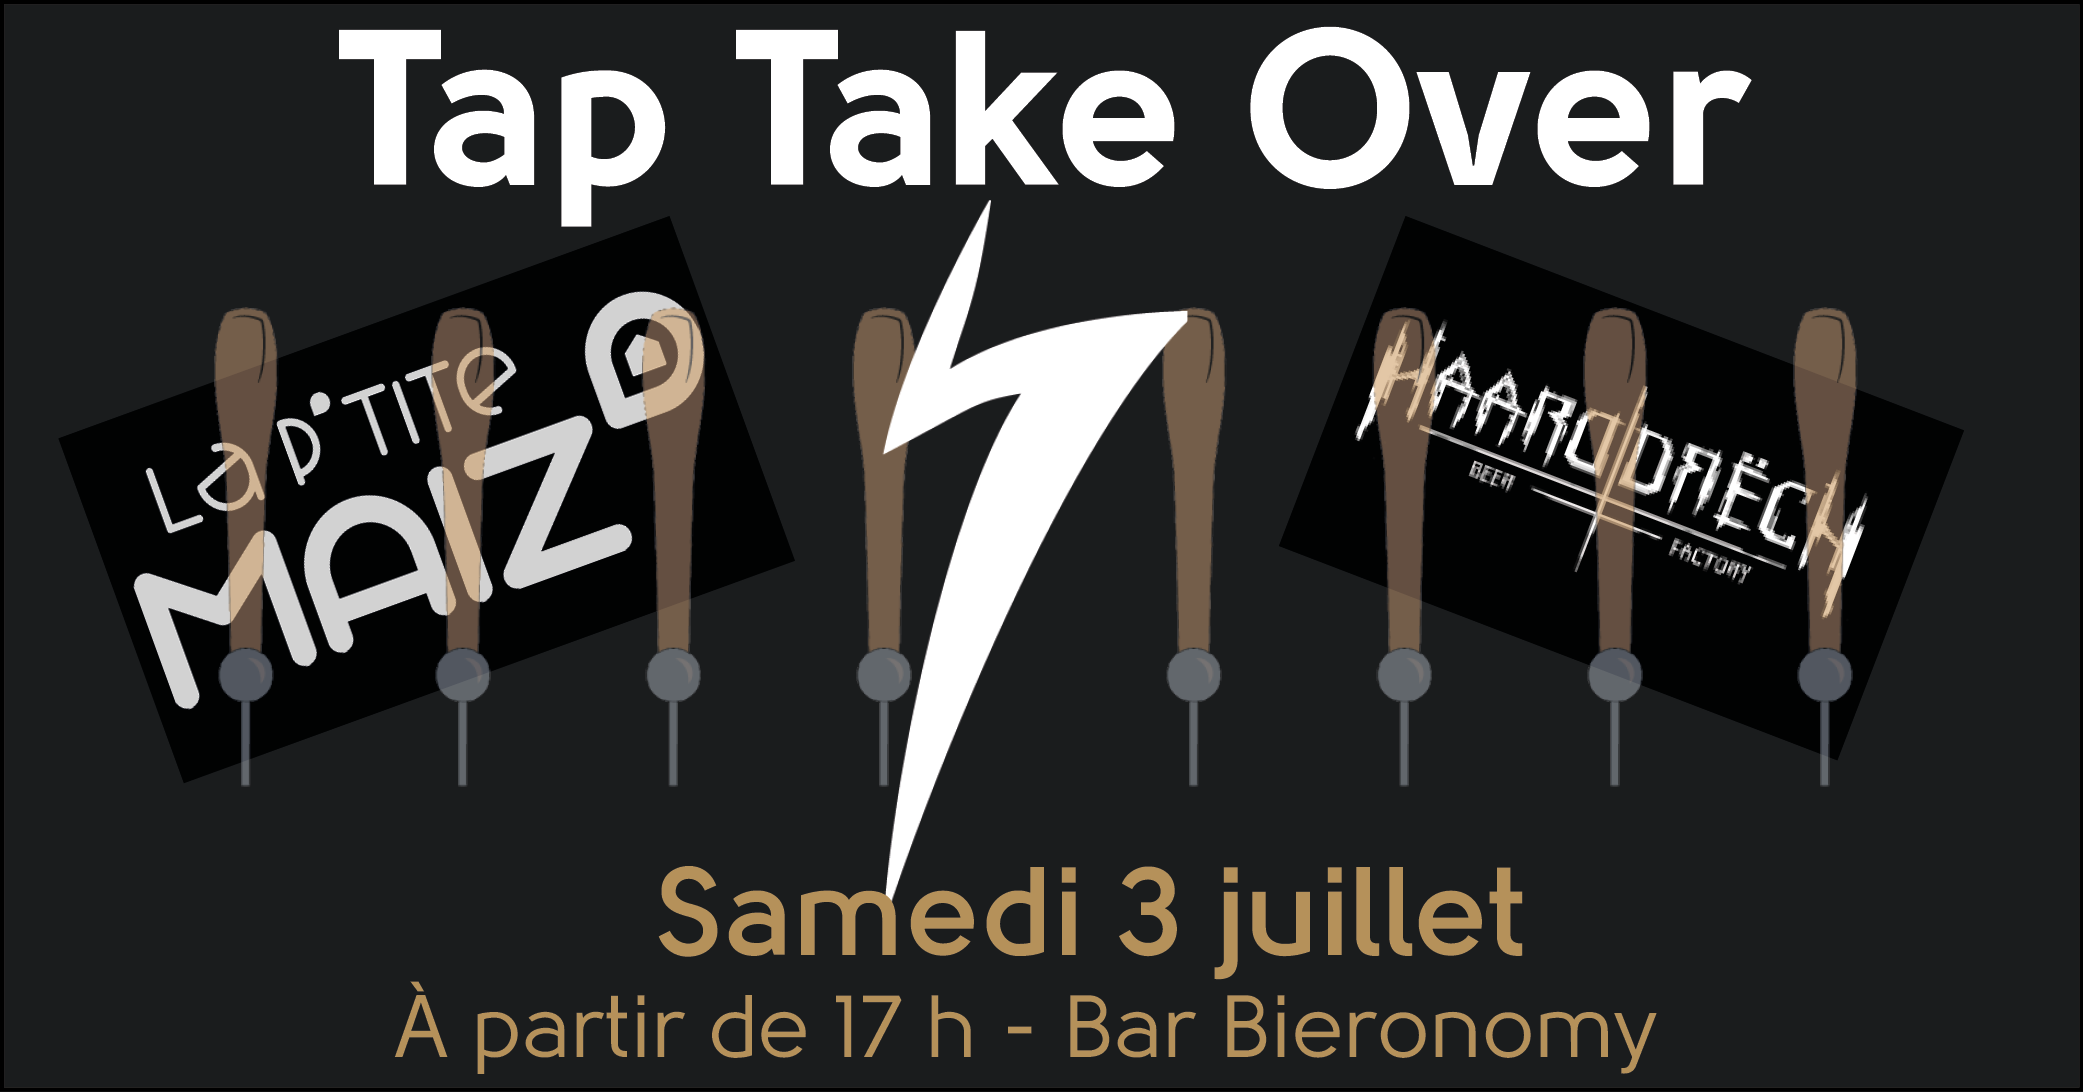 Tap Take Over La P'tite Maiz' & Haarddrëch chez Bieronomy